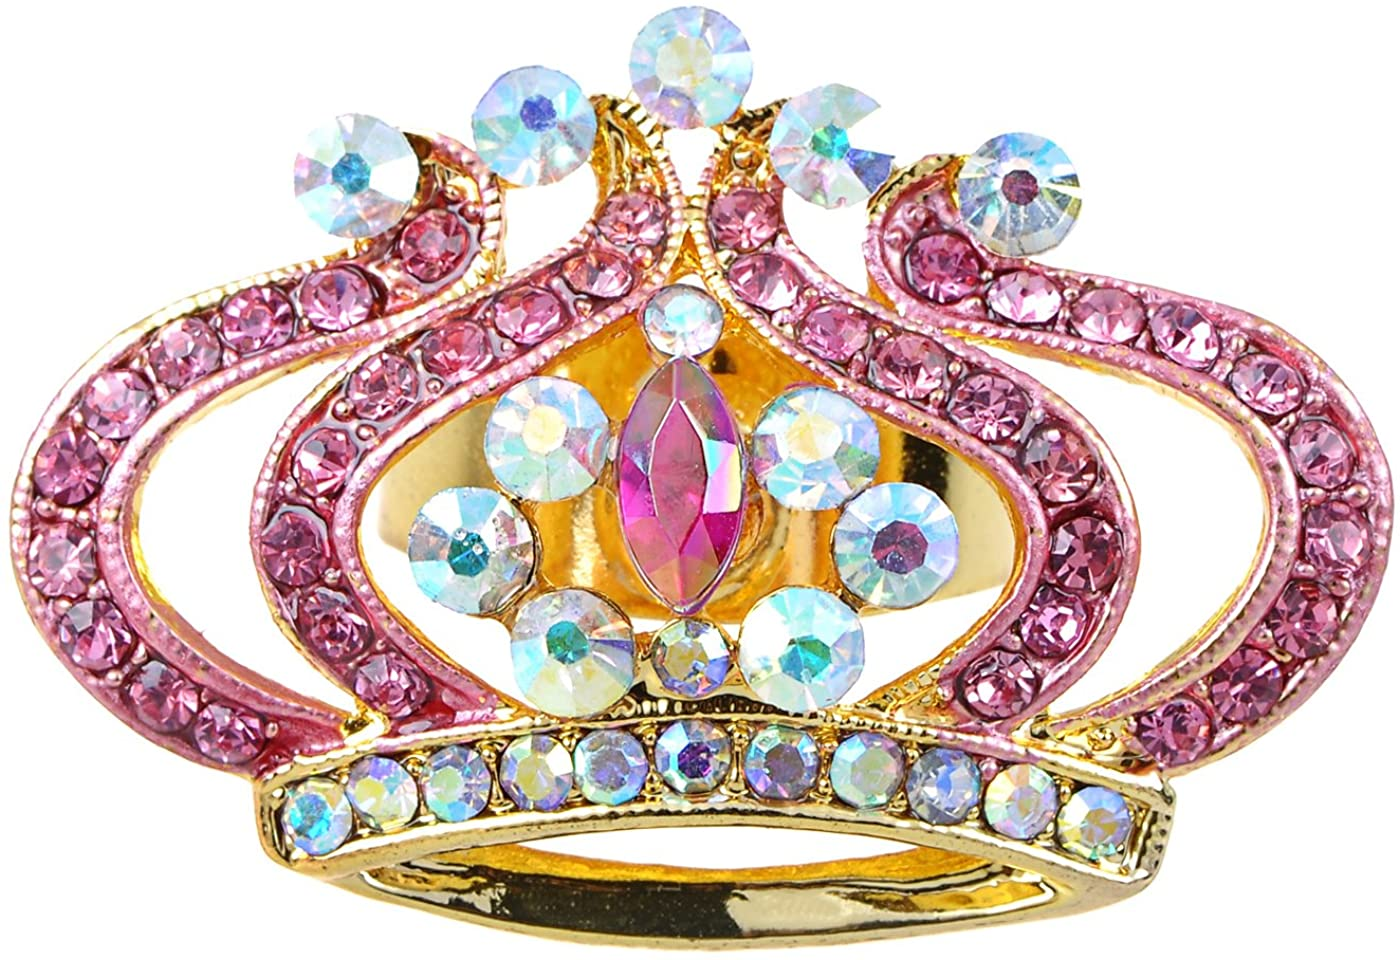 Alilang Women Gold Princess Pink Rose Lady Faux Crystal Rhinestone Crown King Adjustable Ring